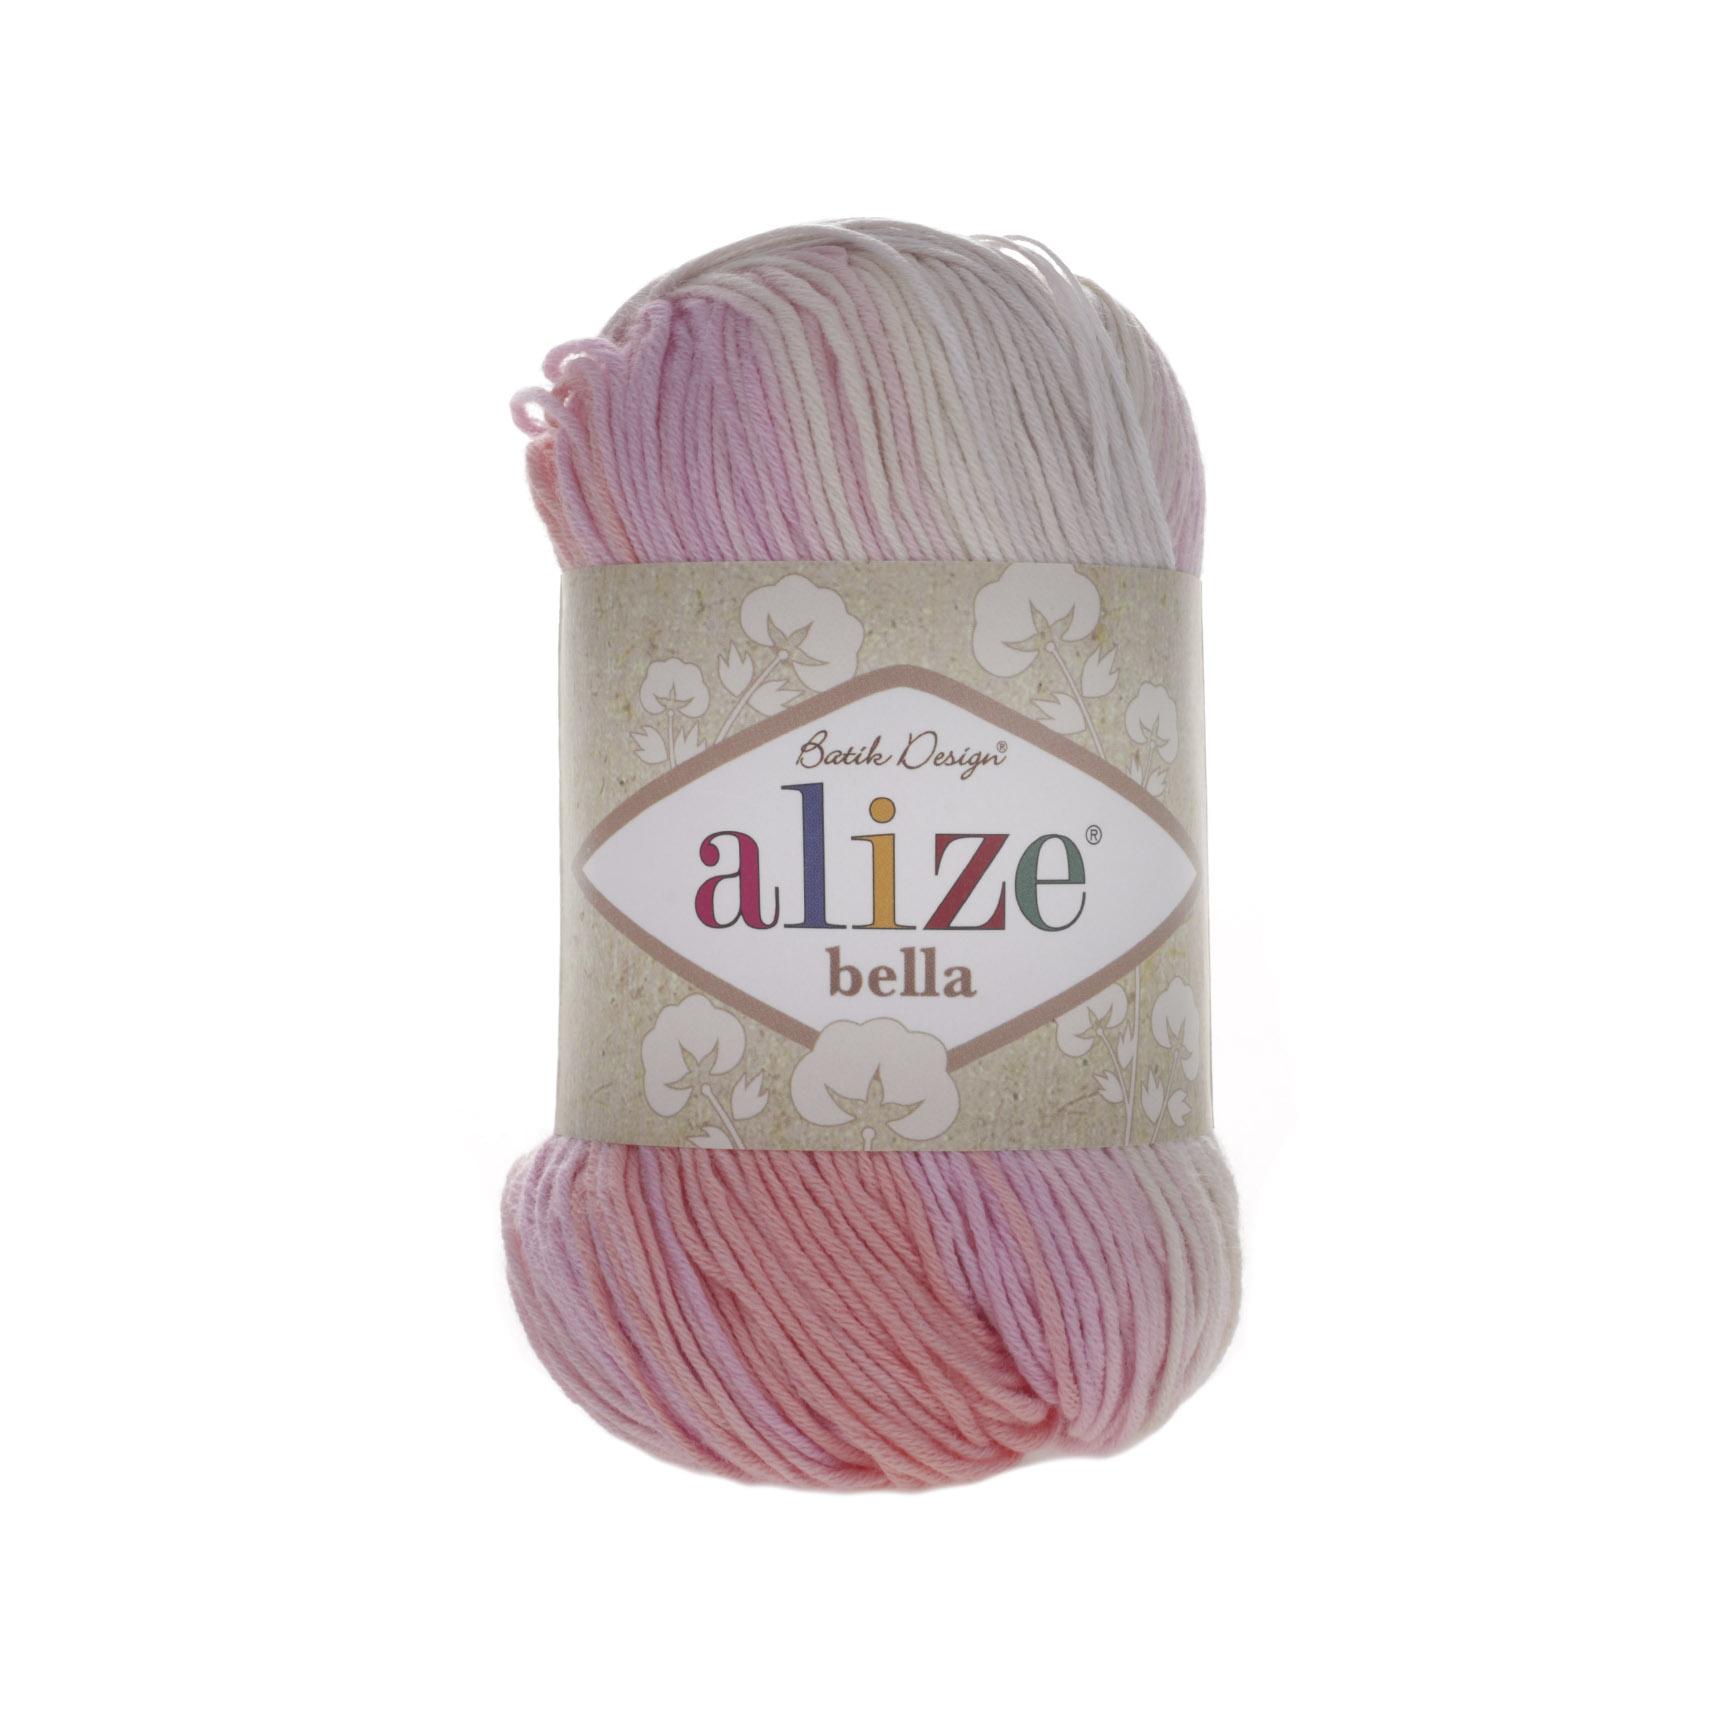 Alize Bella Batik Design Cod 2807-0